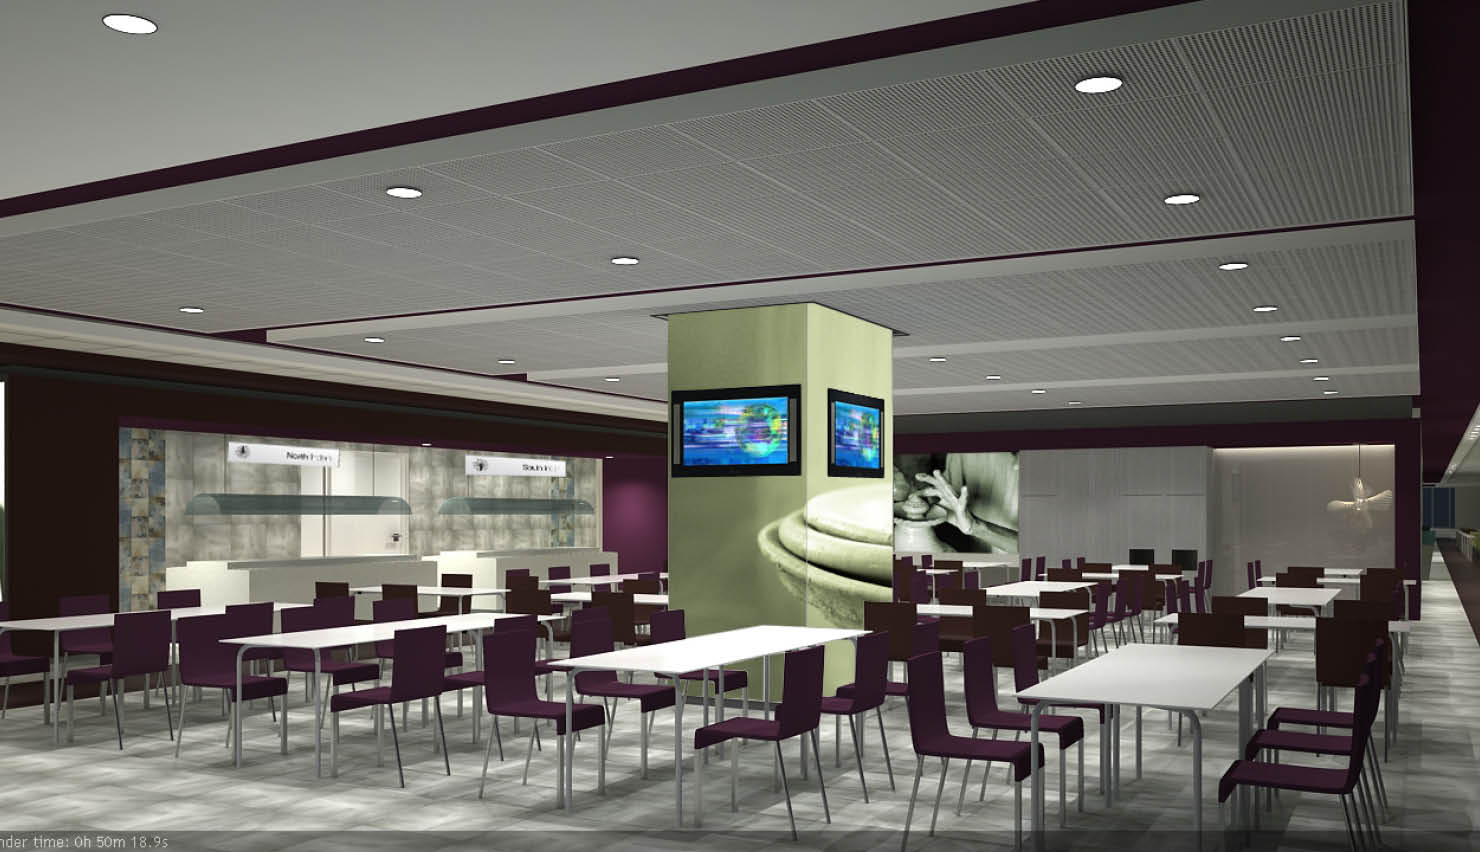 Technology Rezonant Design Cisco B16 Cafe Design 01 1